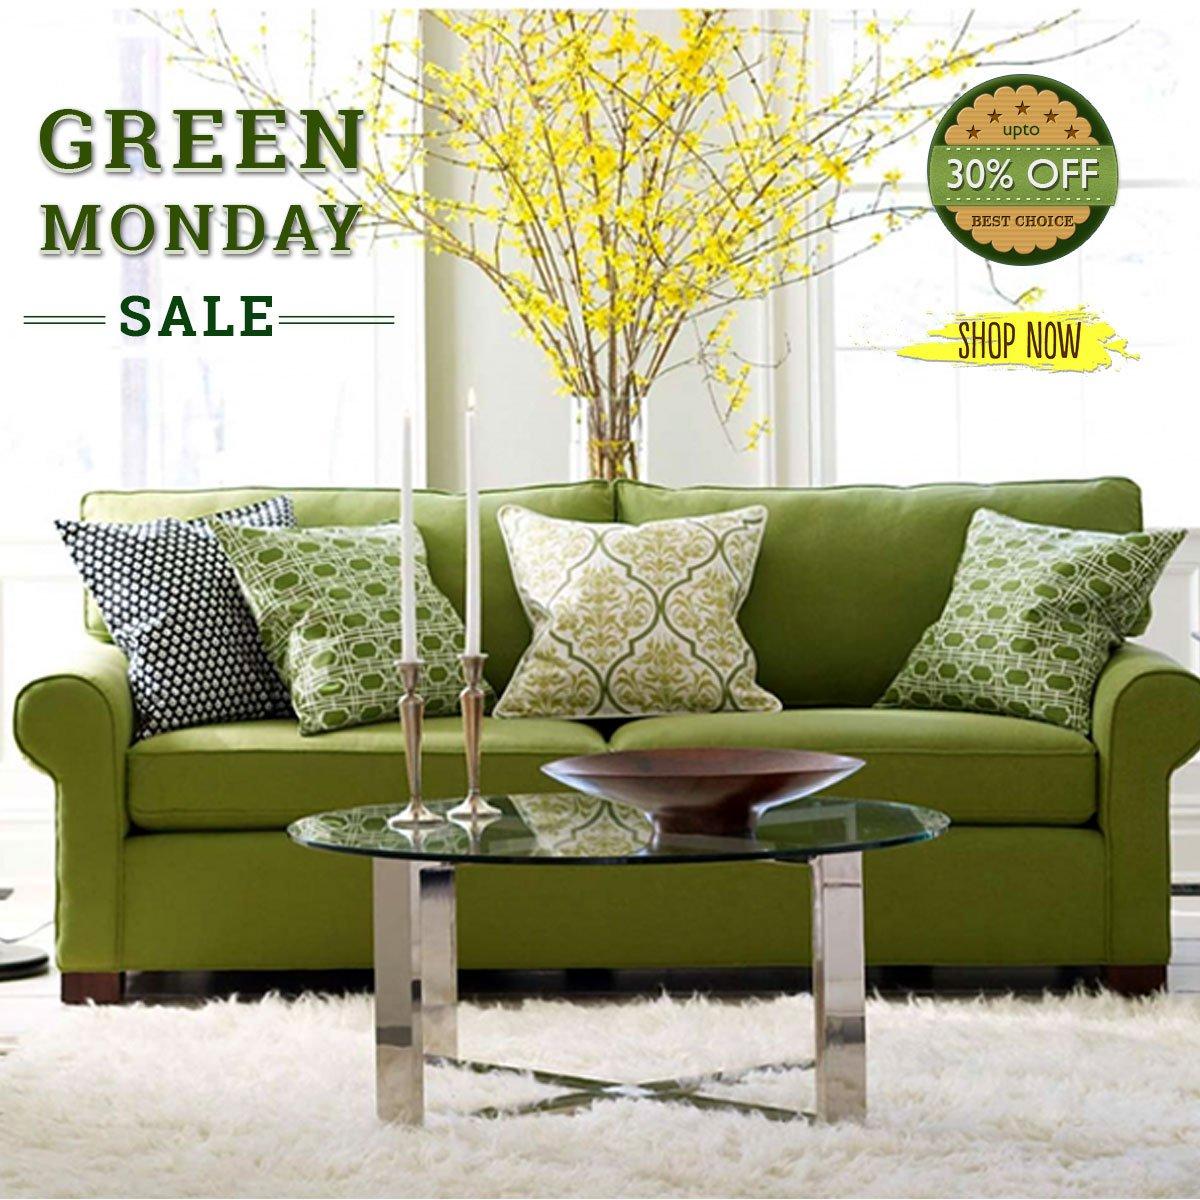 Green monday home decor sale get upto 30 off http casagear com casagear greenmonday newdeals deals sale interior interiors homestyling